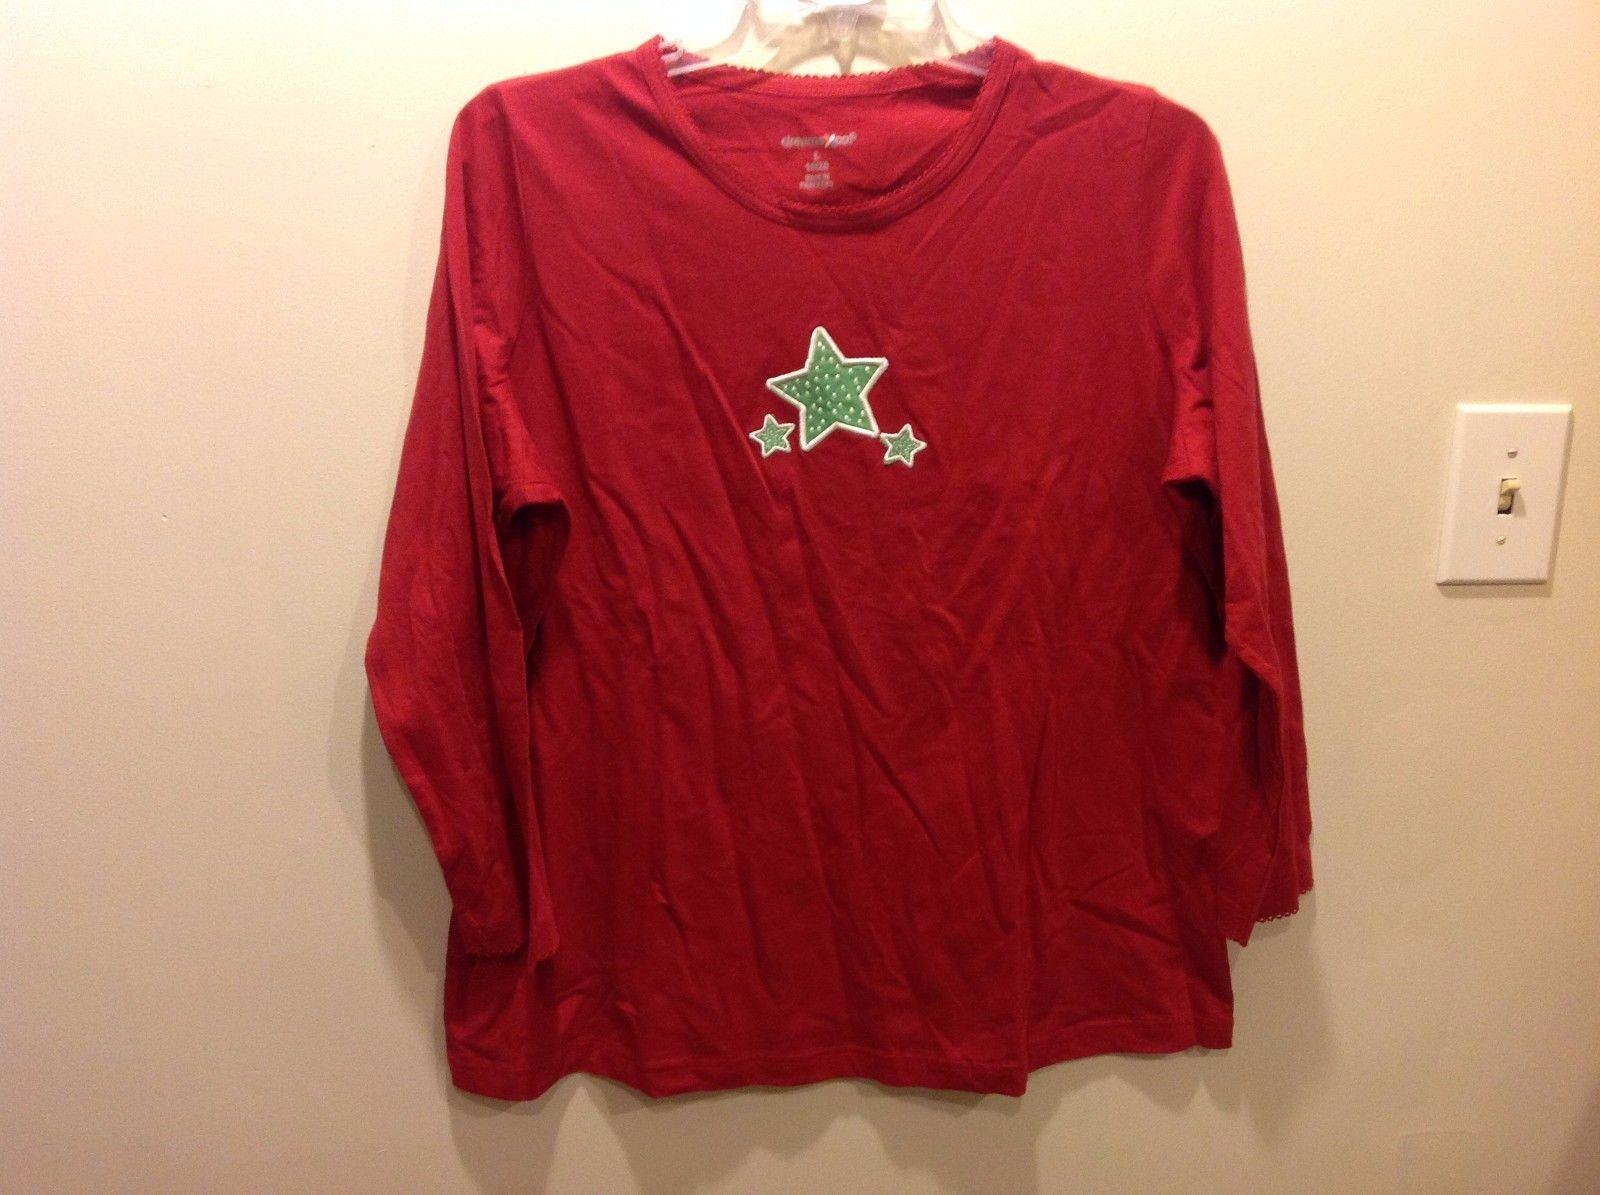 Dreams Co Festive Red Long Sleeve PJ Top w Green White Stars Sz L 18/20